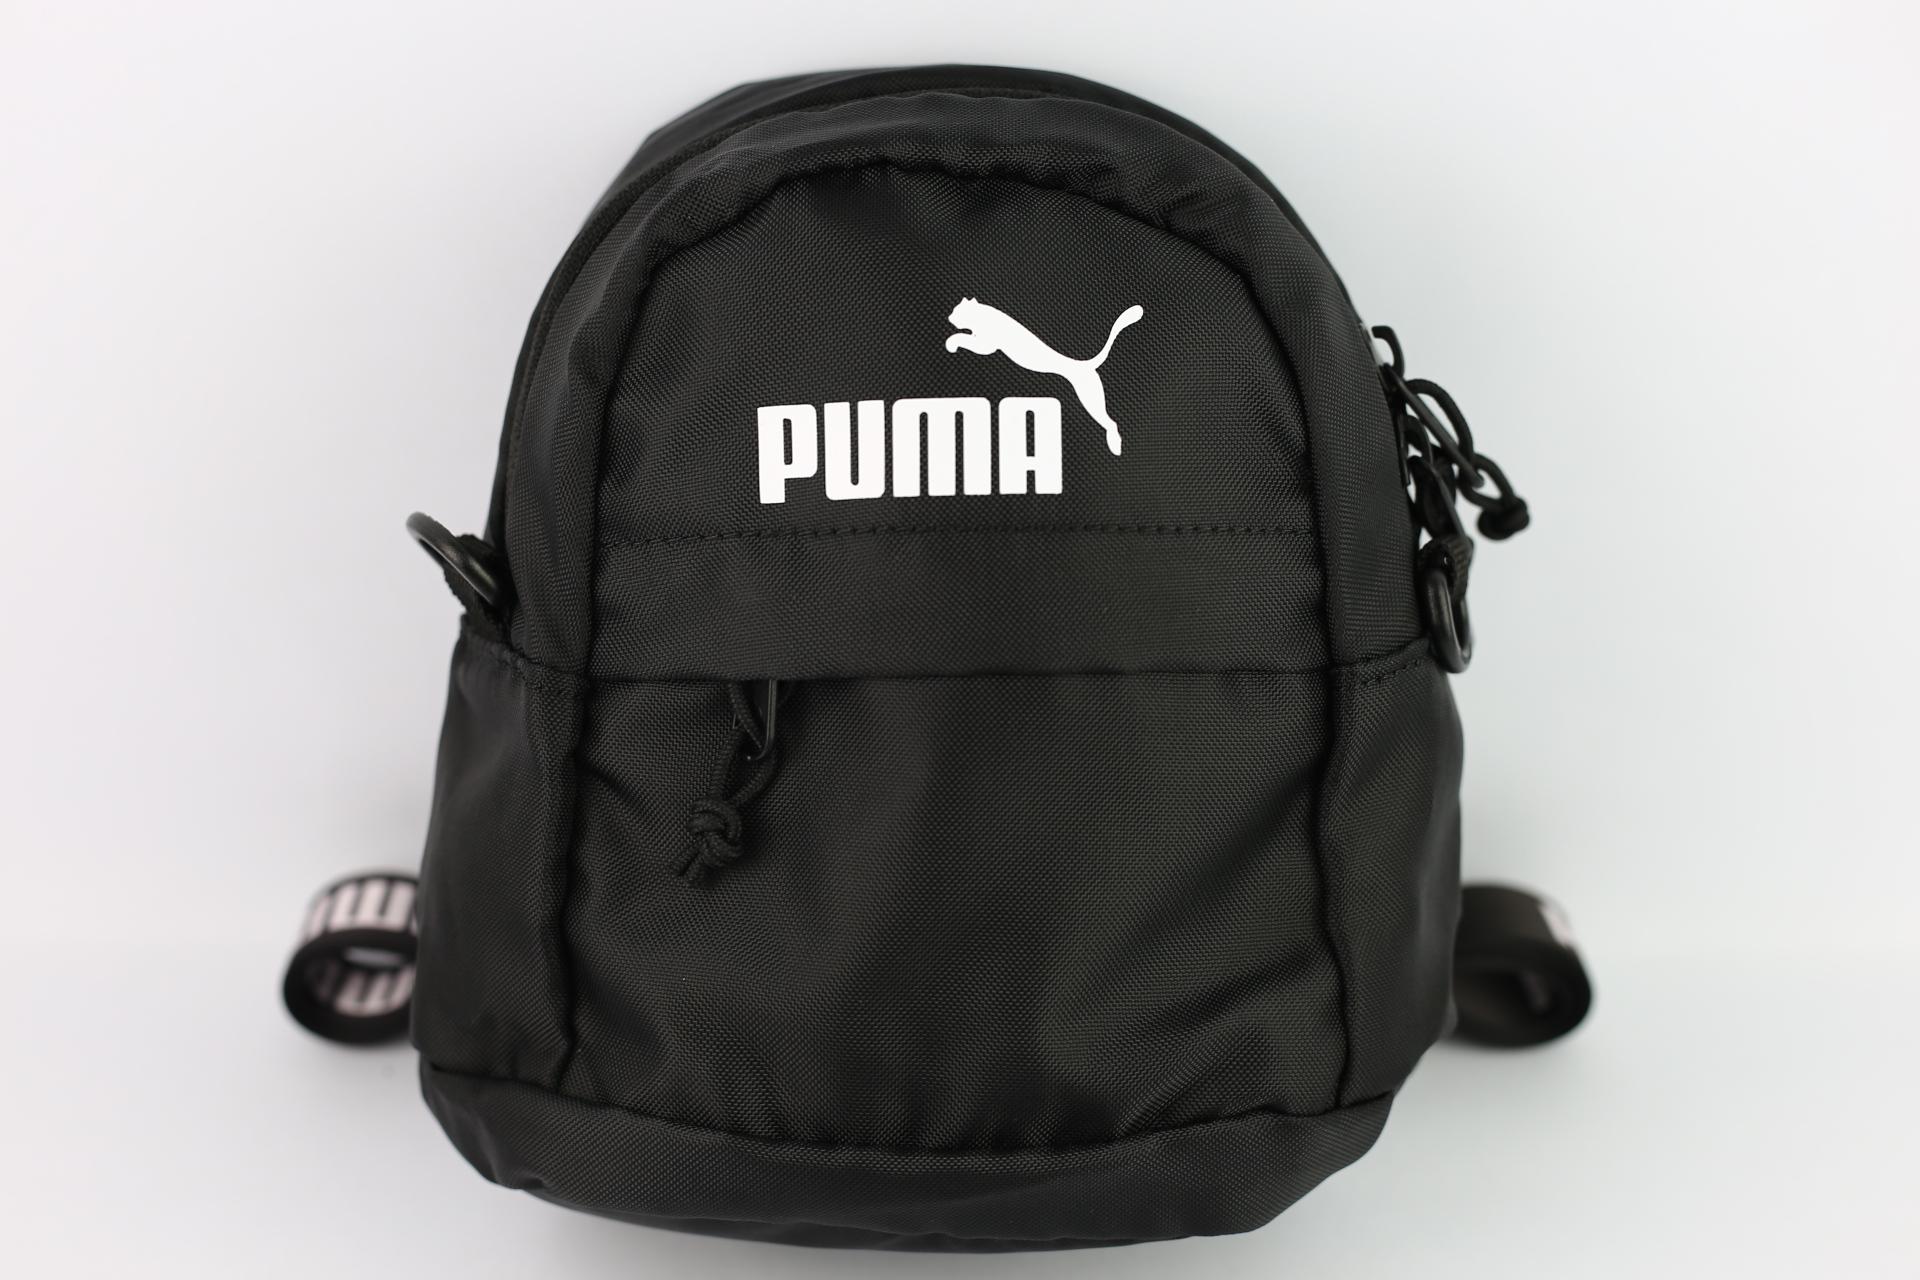 balo-thoi-trang-puma-minime-backpack-core-black-076154-01-hang-chinh-hang